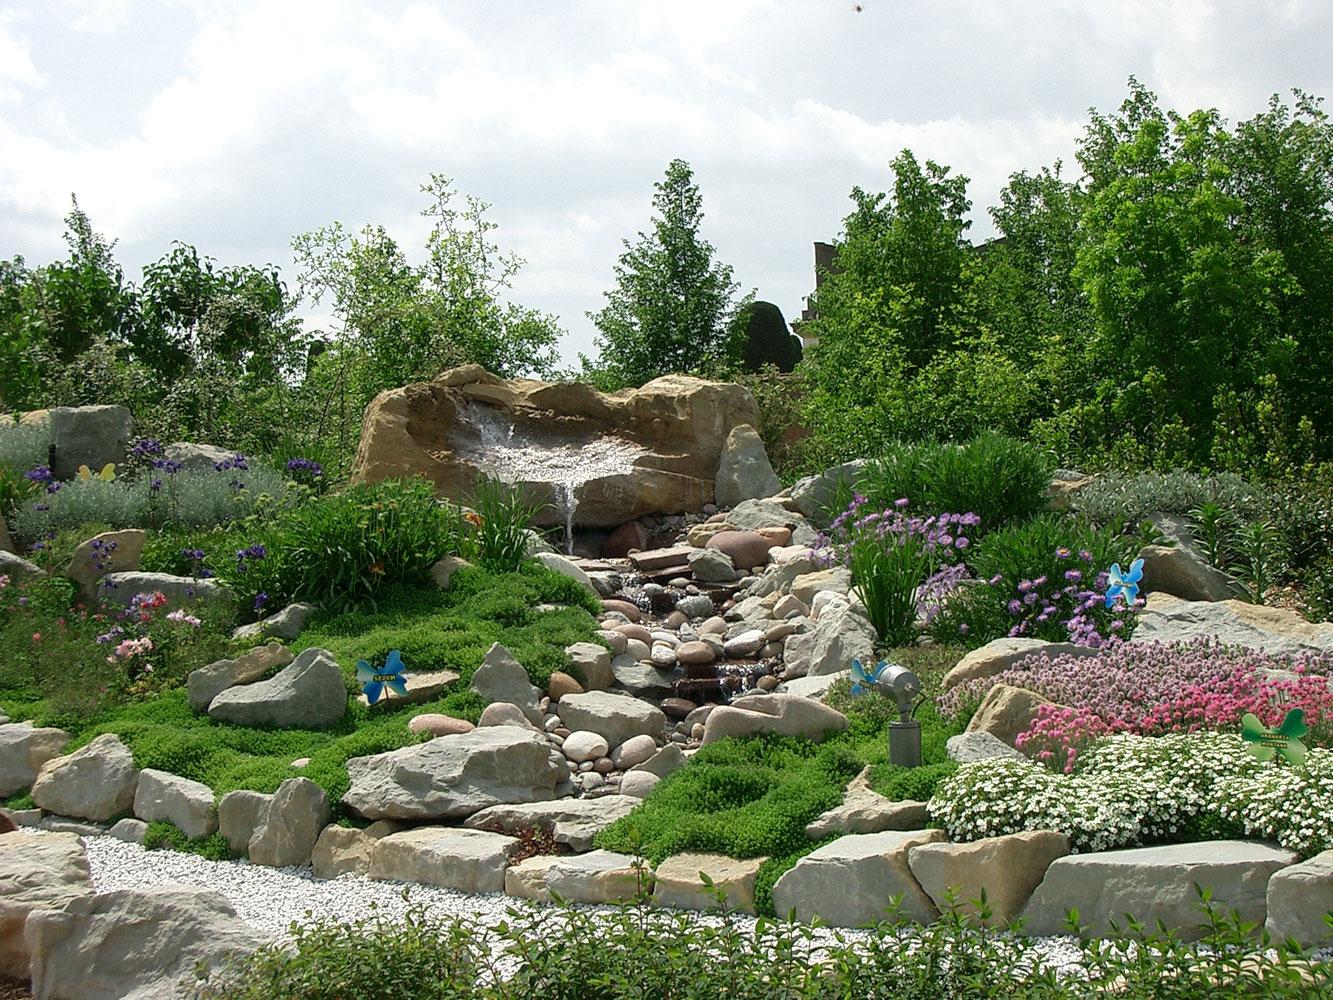 La montagna il giardino degli angeli - Il giardino degli angeli ...